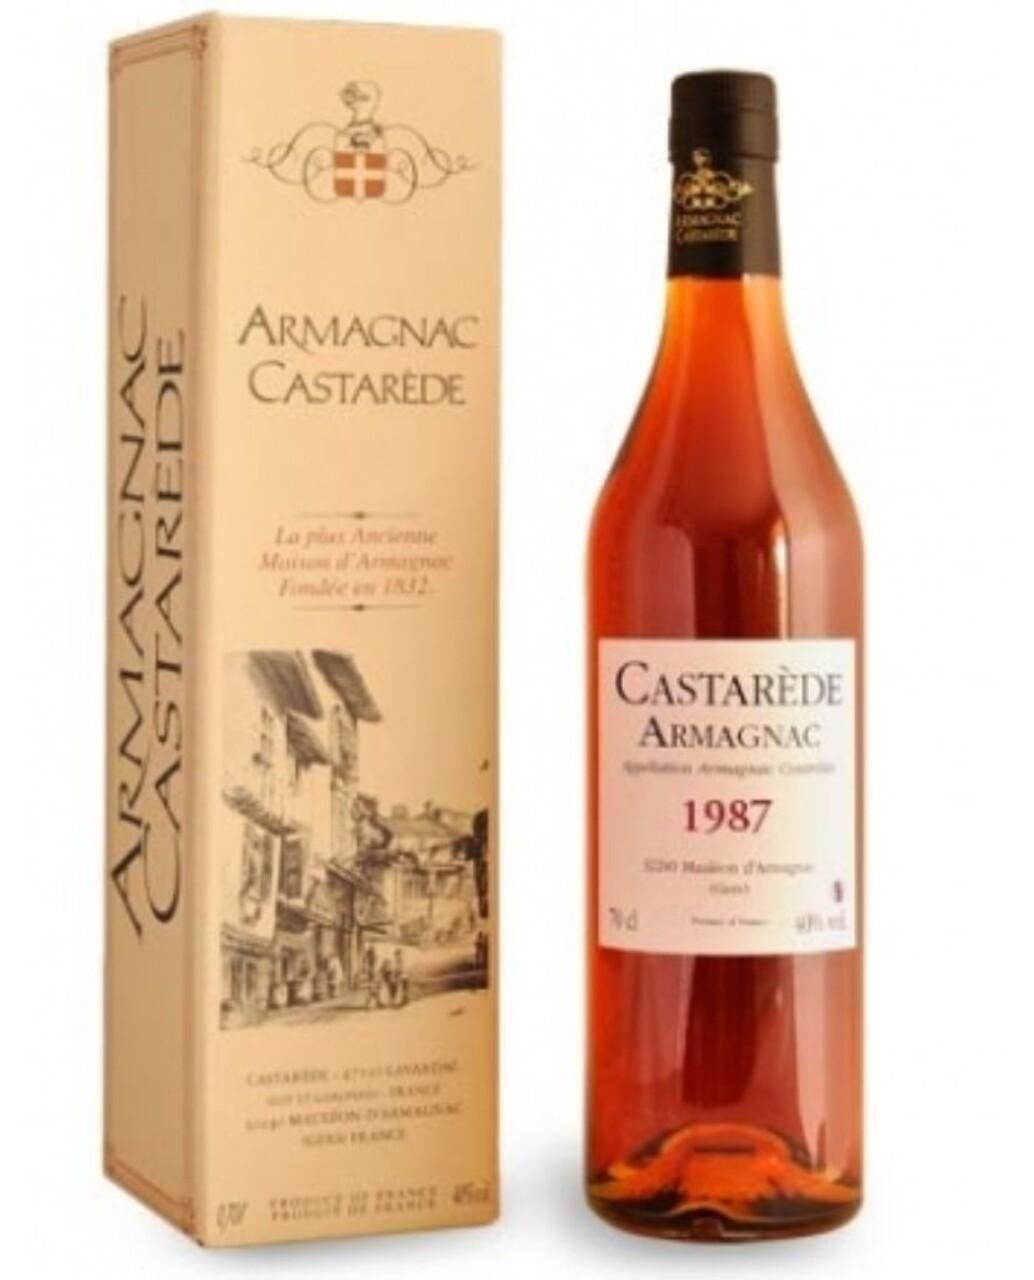 ARMAGNAC CASTAREDE 1987